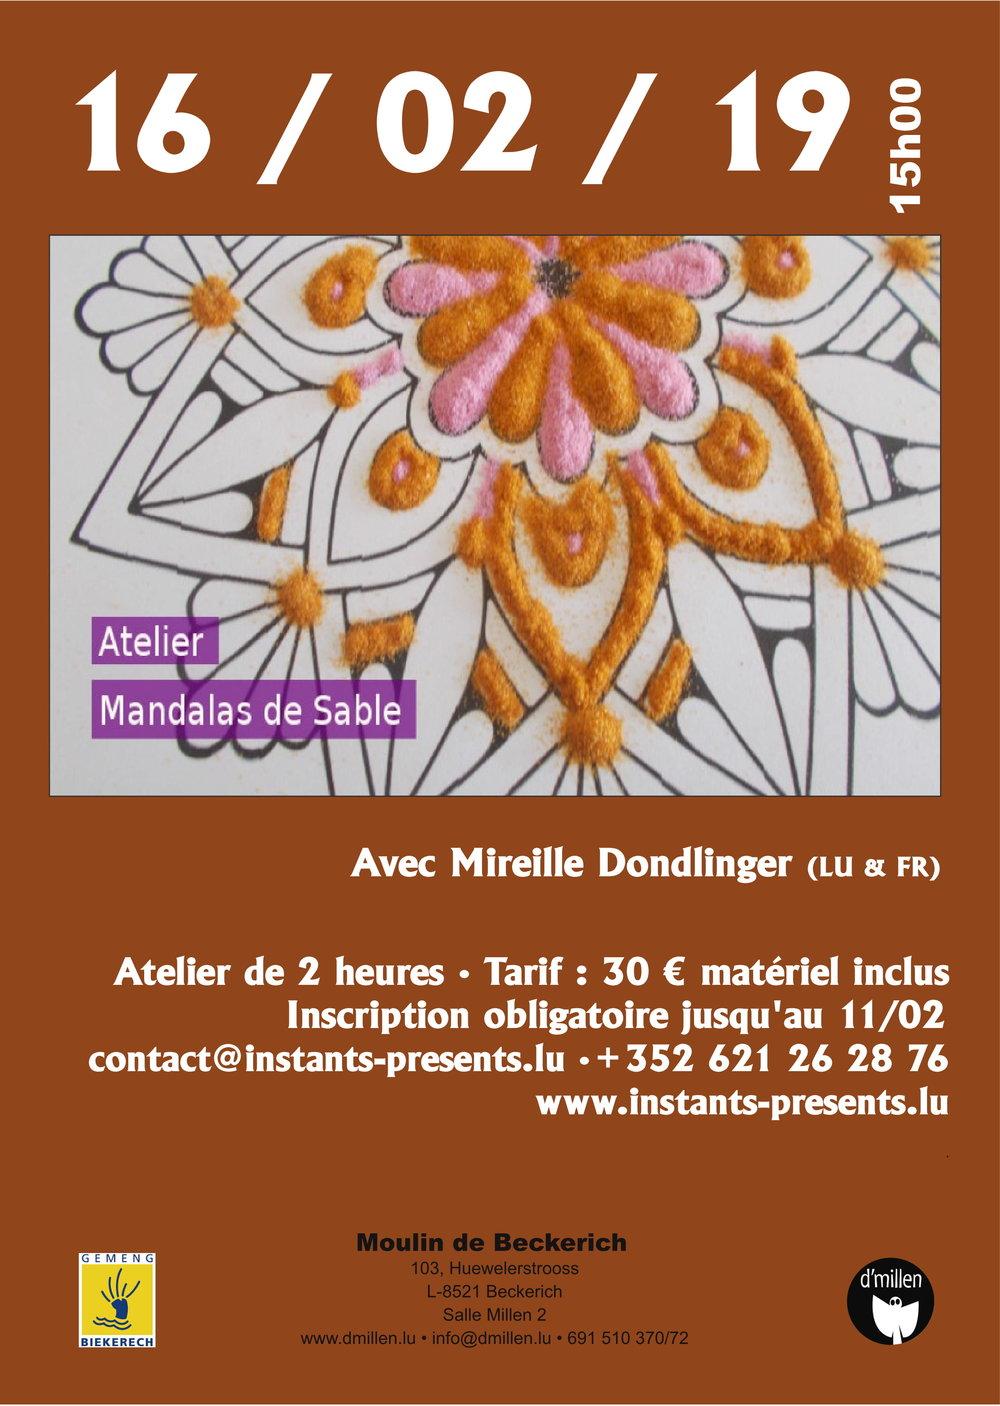 Affiche Atelier Mandala-bd-1.jpg